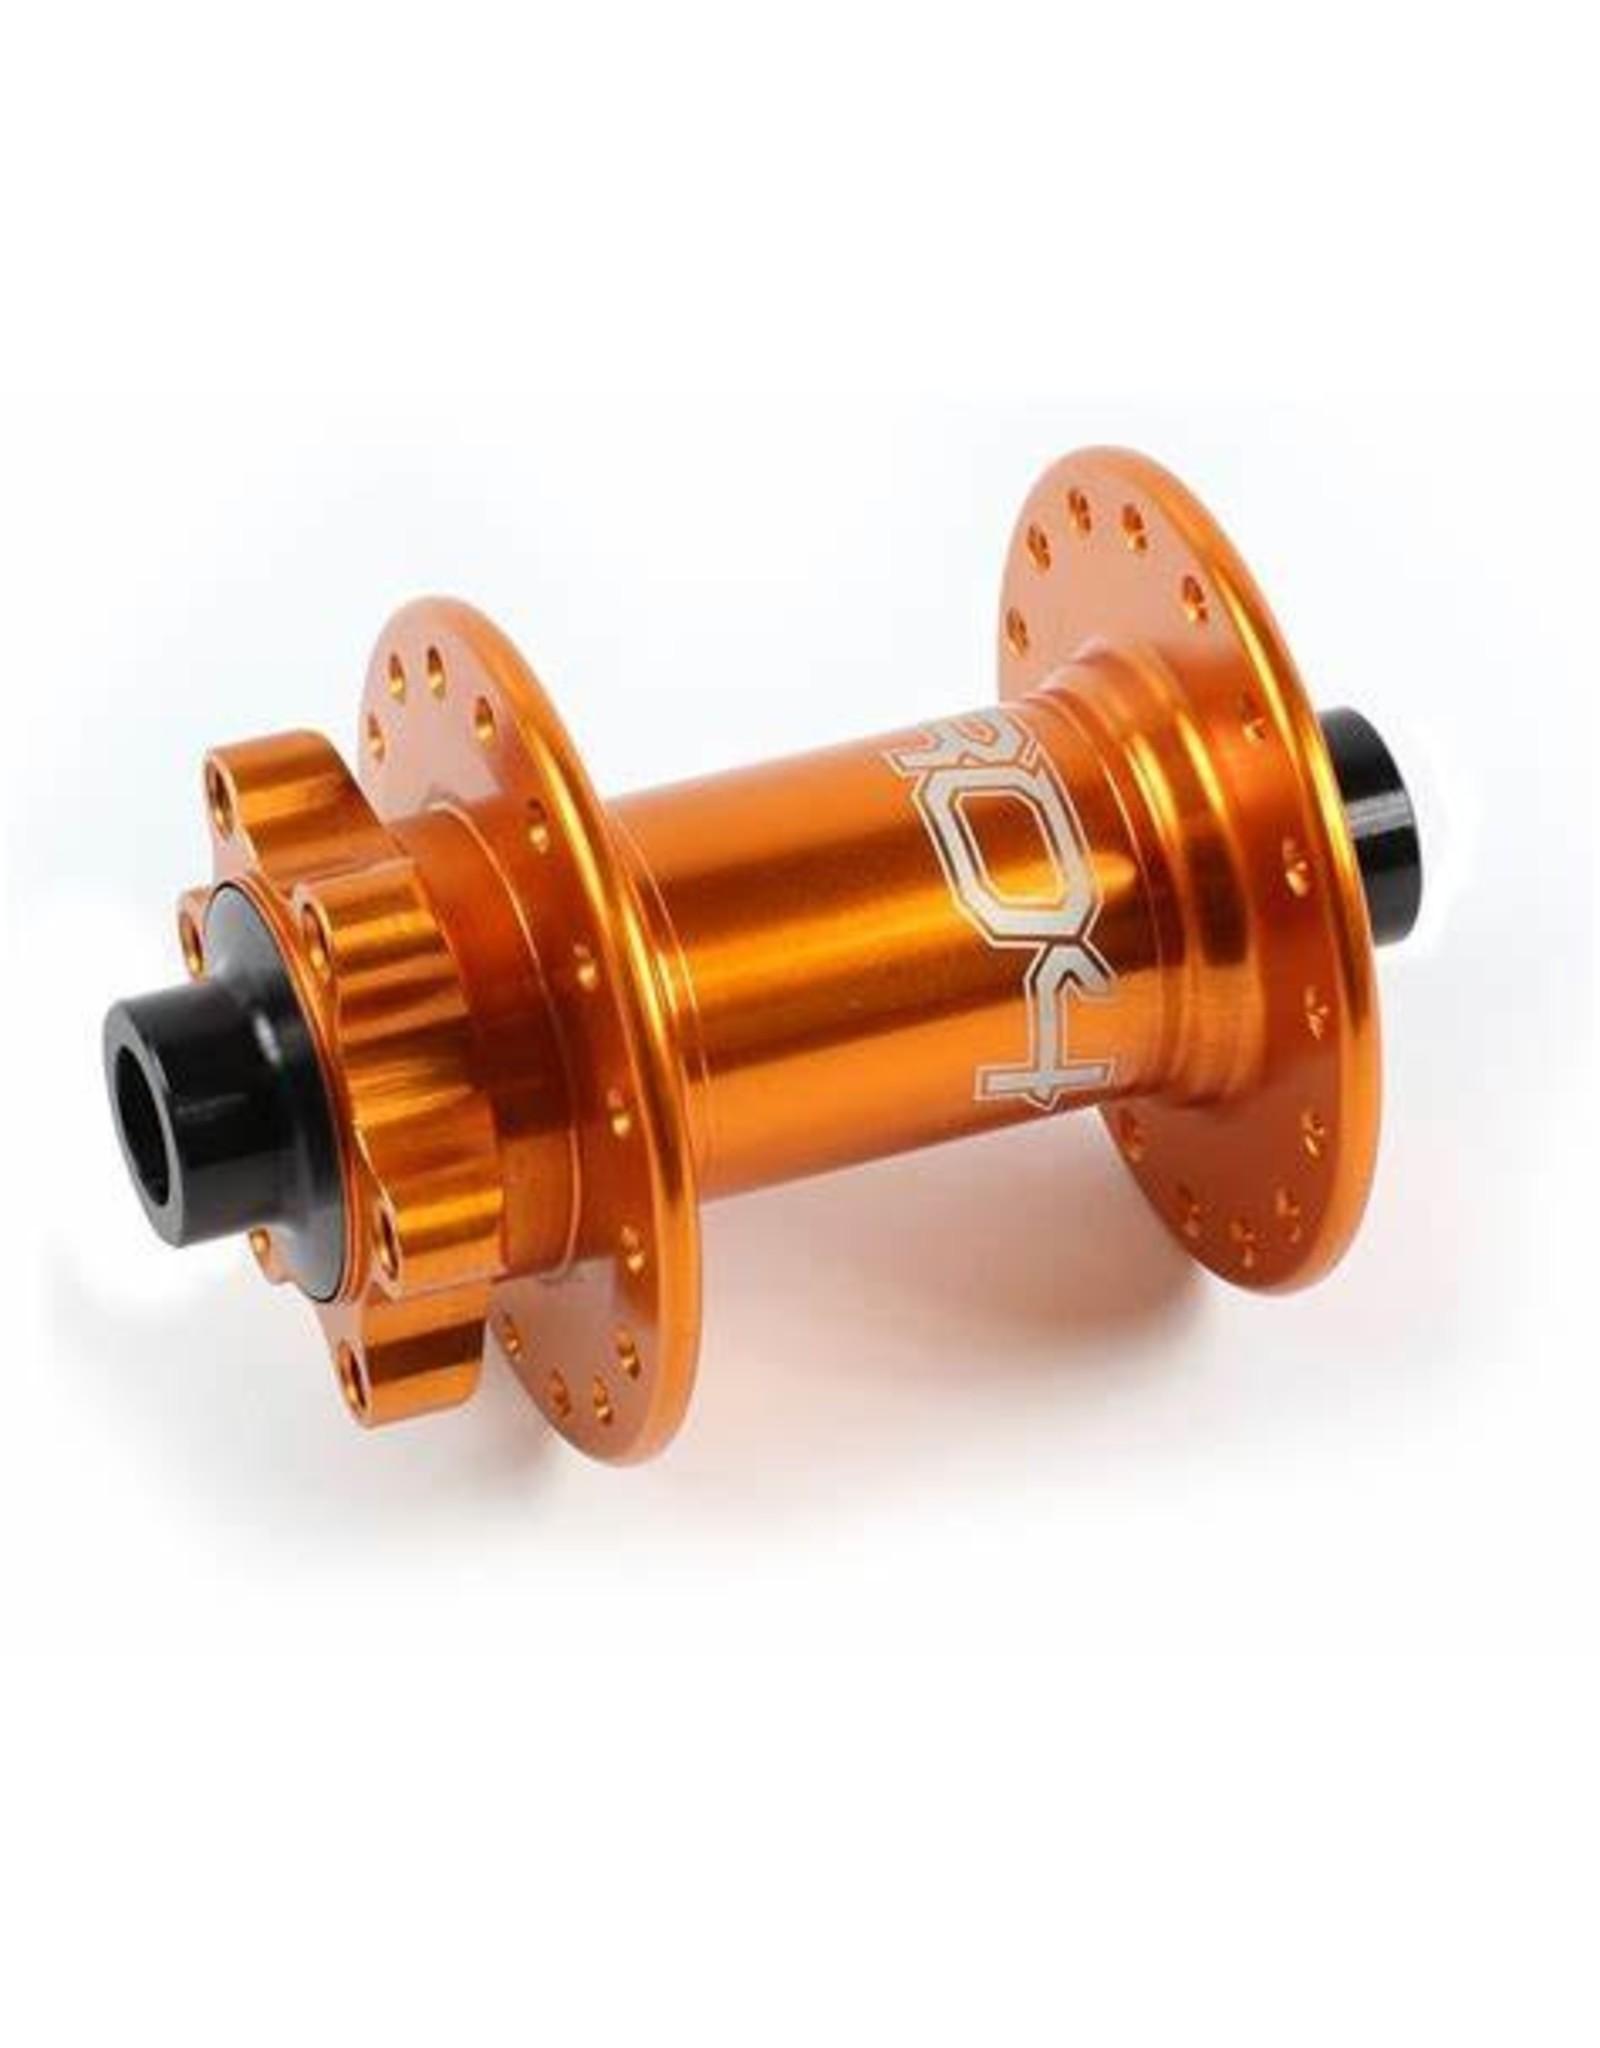 Hope pro 4 32t avant, orange 110mm x 15mm